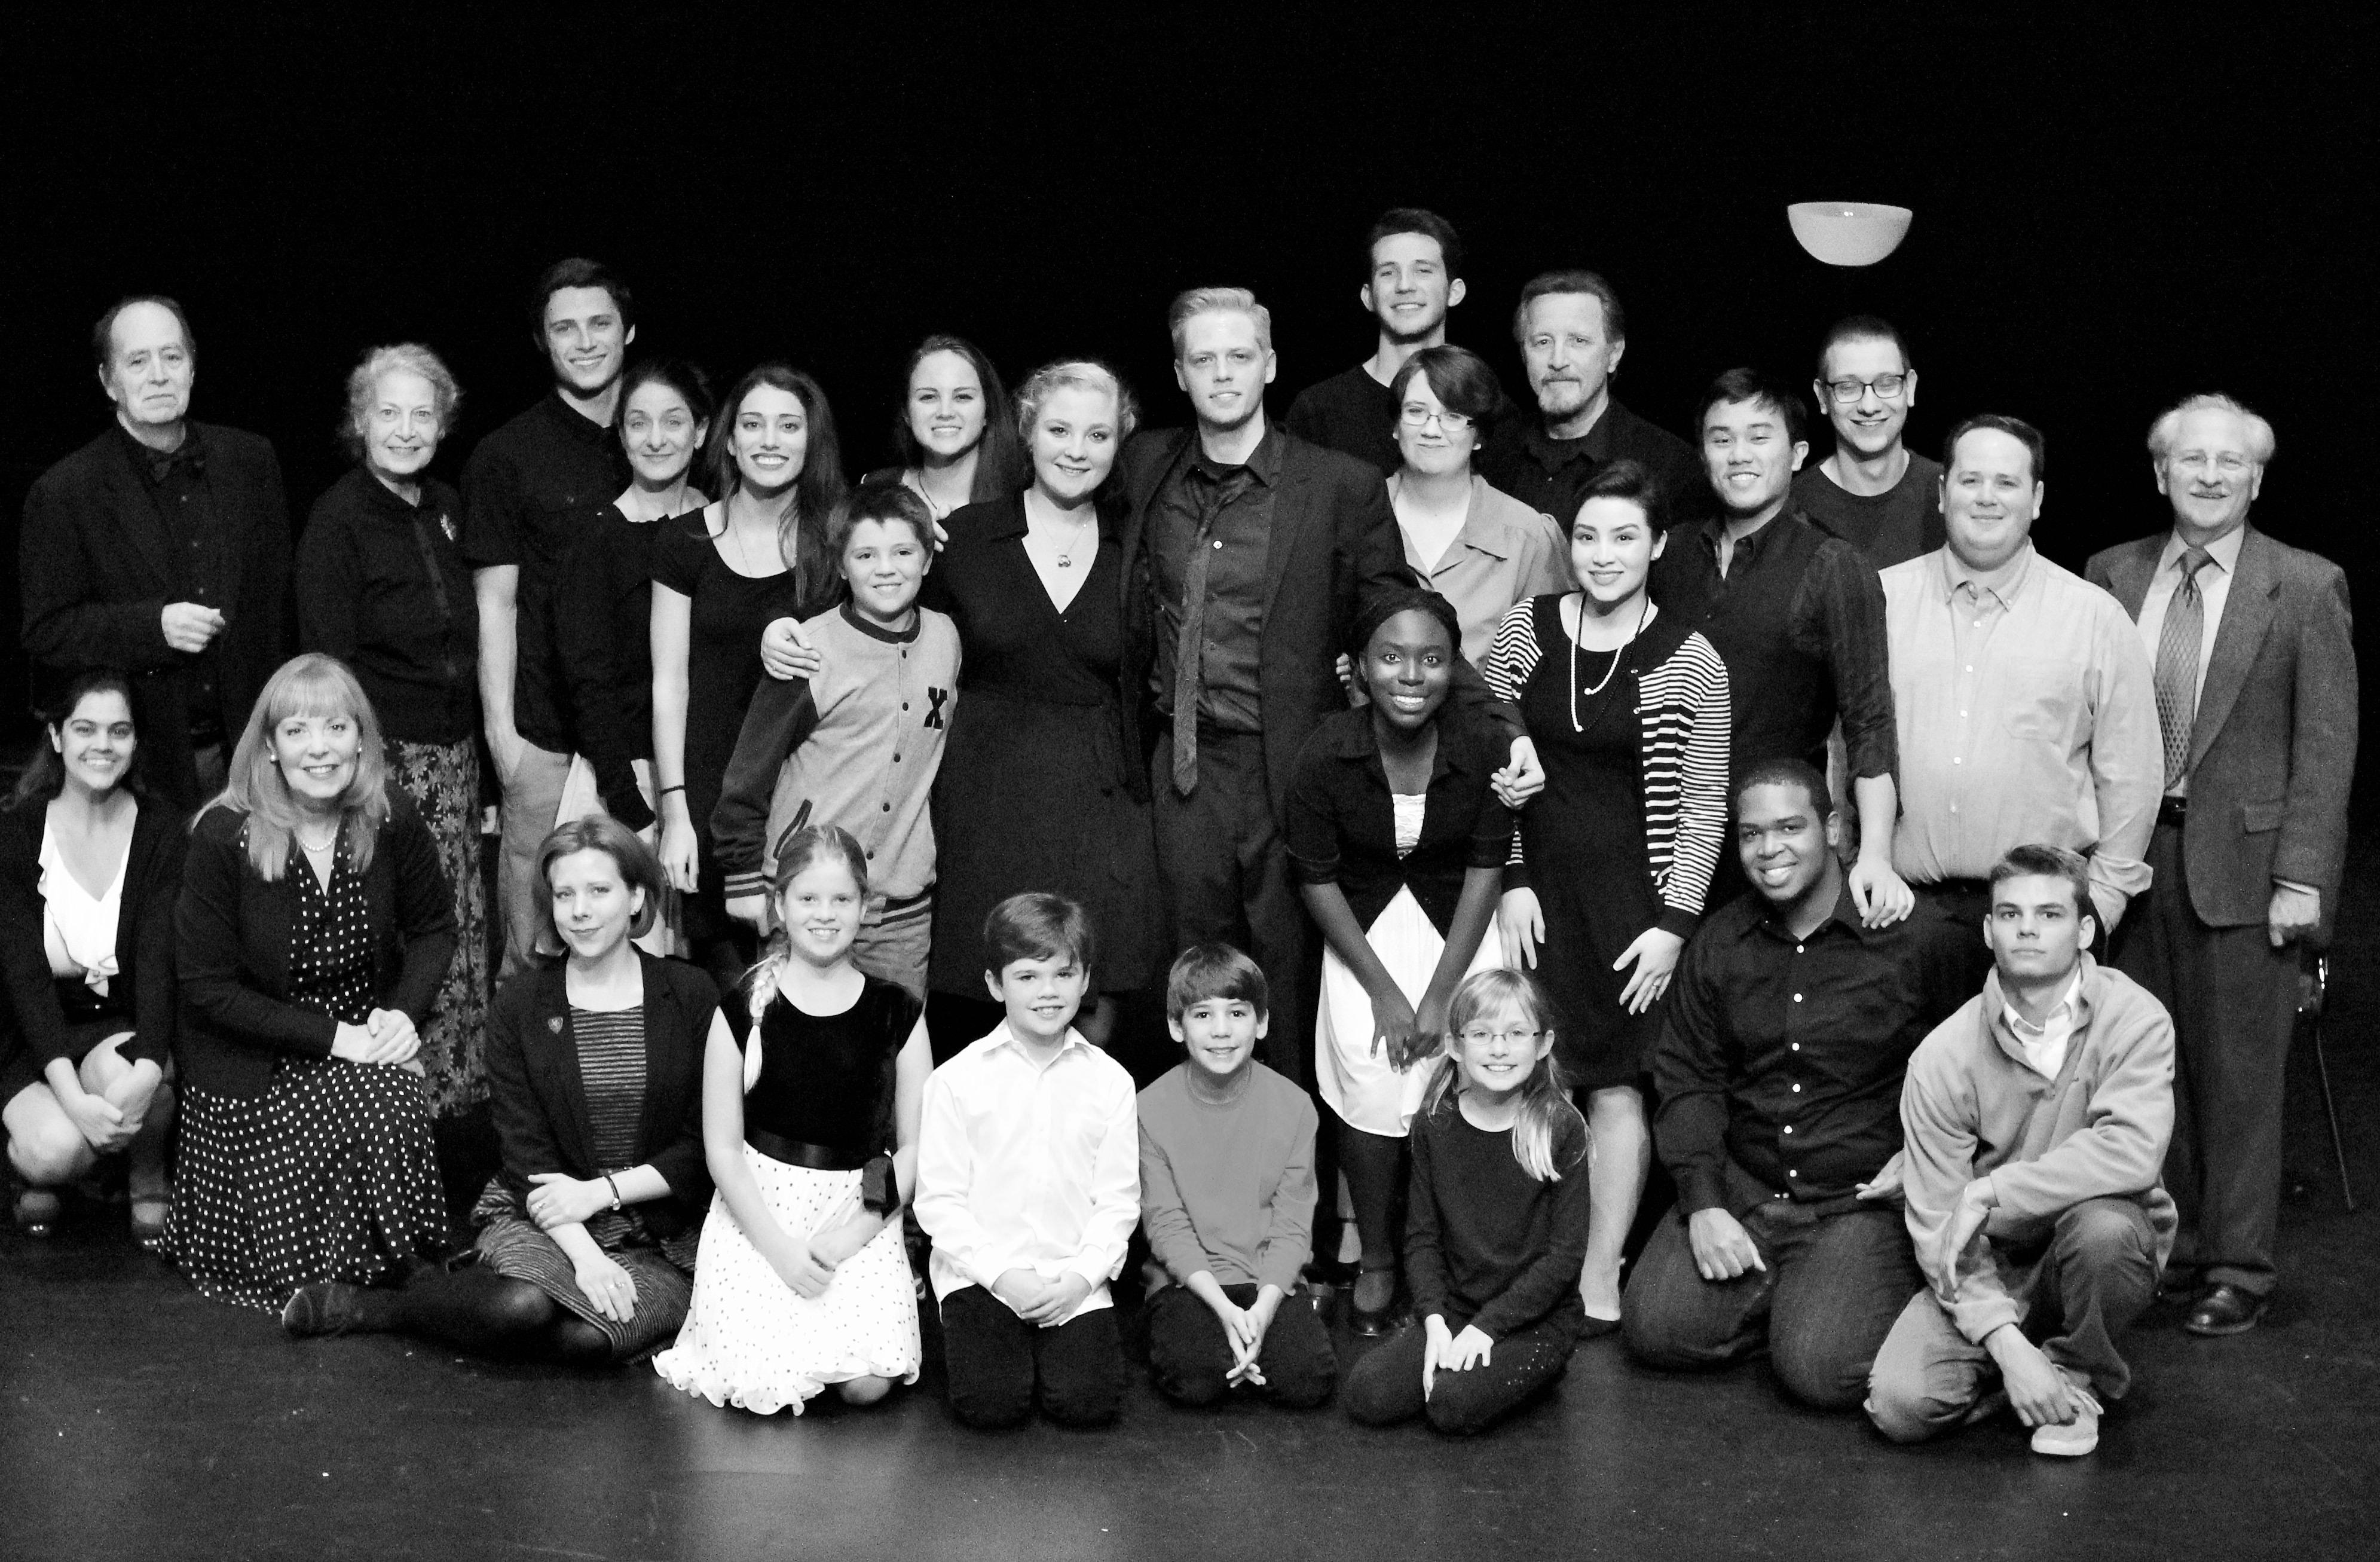 Cast of 'It's a Wonderful Life'.